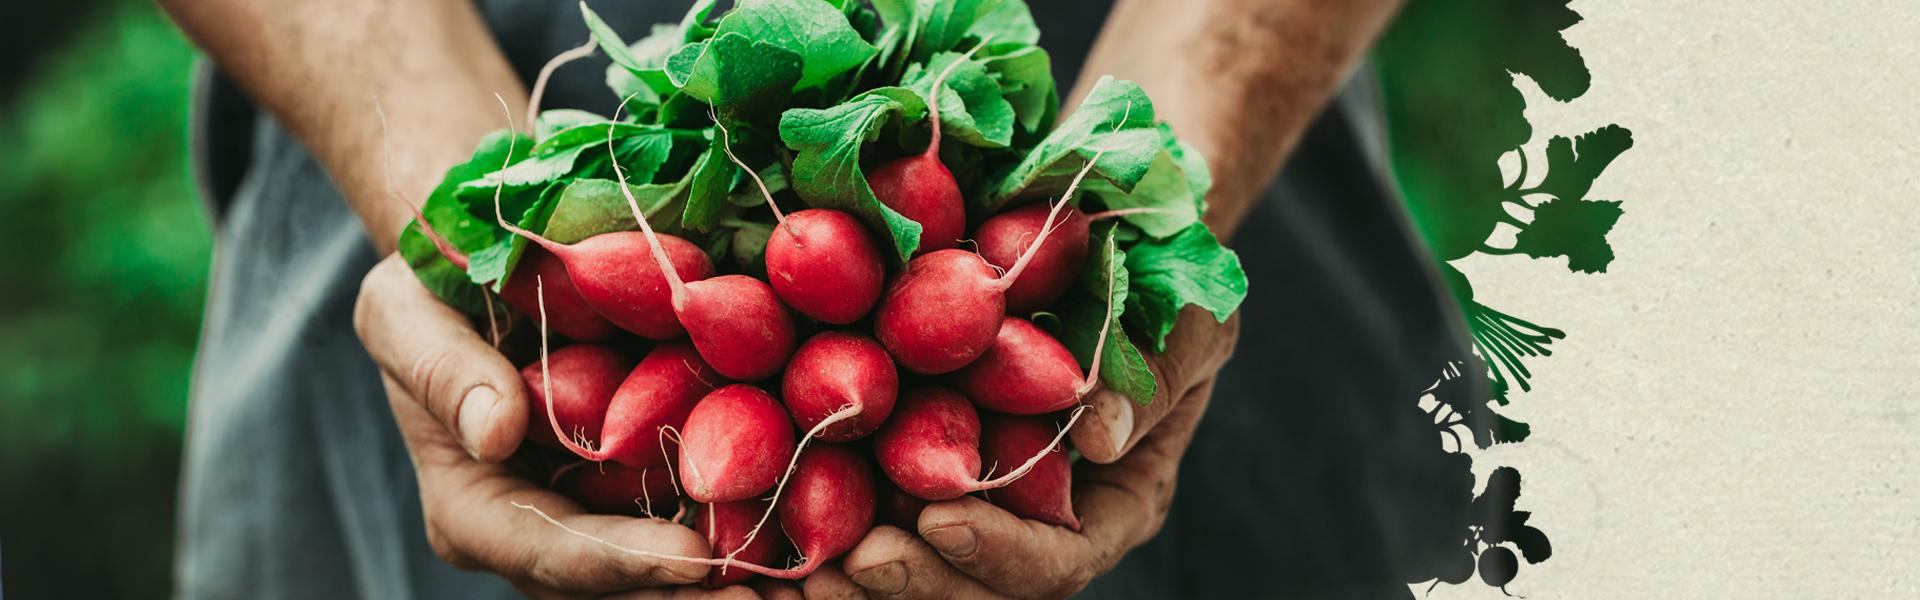 Charlie's Produce Header | Seattle Marketing Agency | CMA